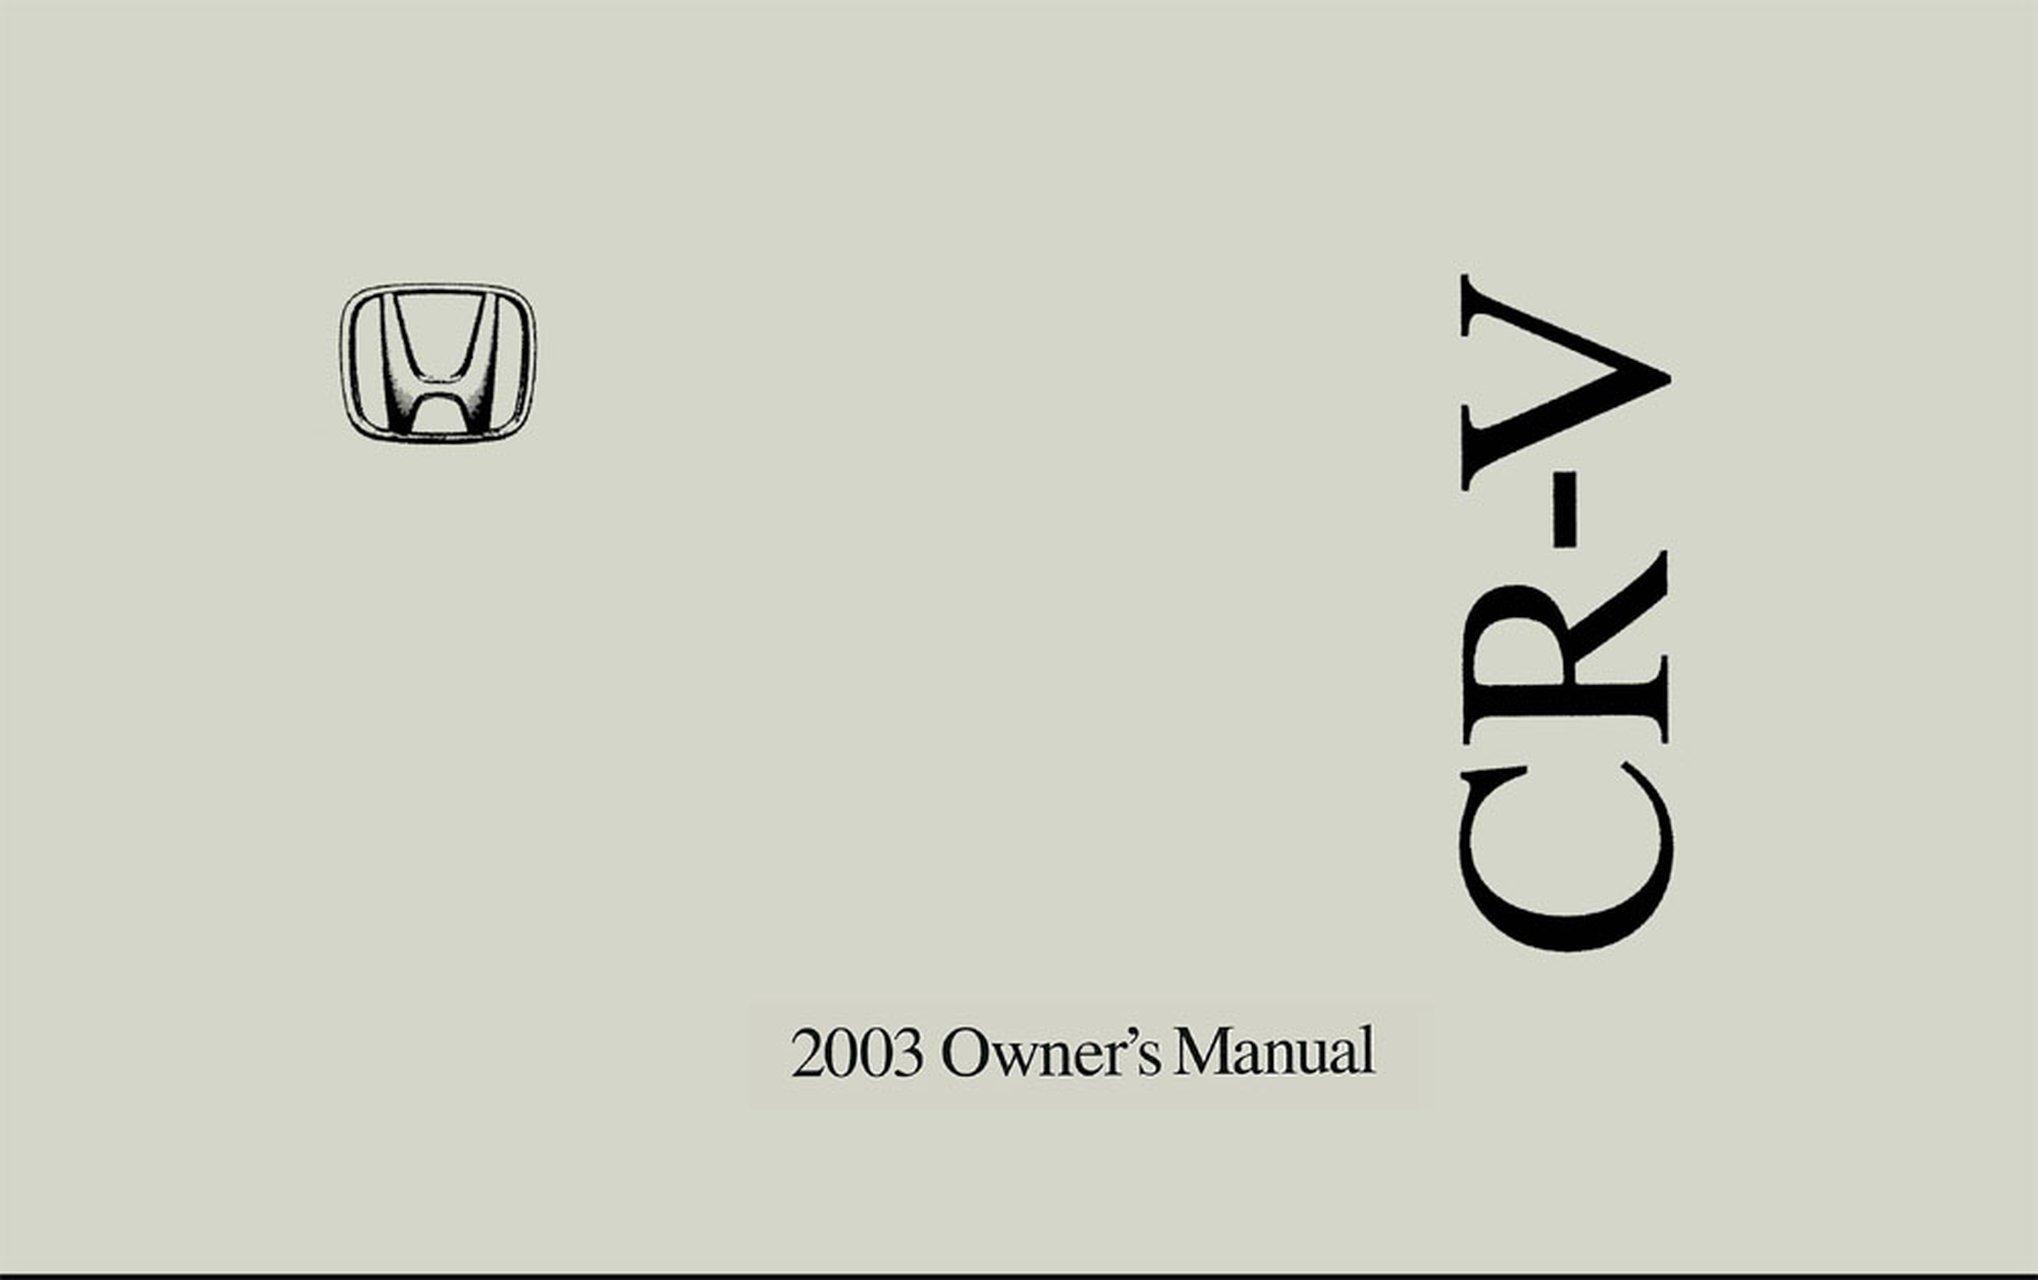 Bishko OEM Maintenance Owner's Manual Bound for Honda Cr-V